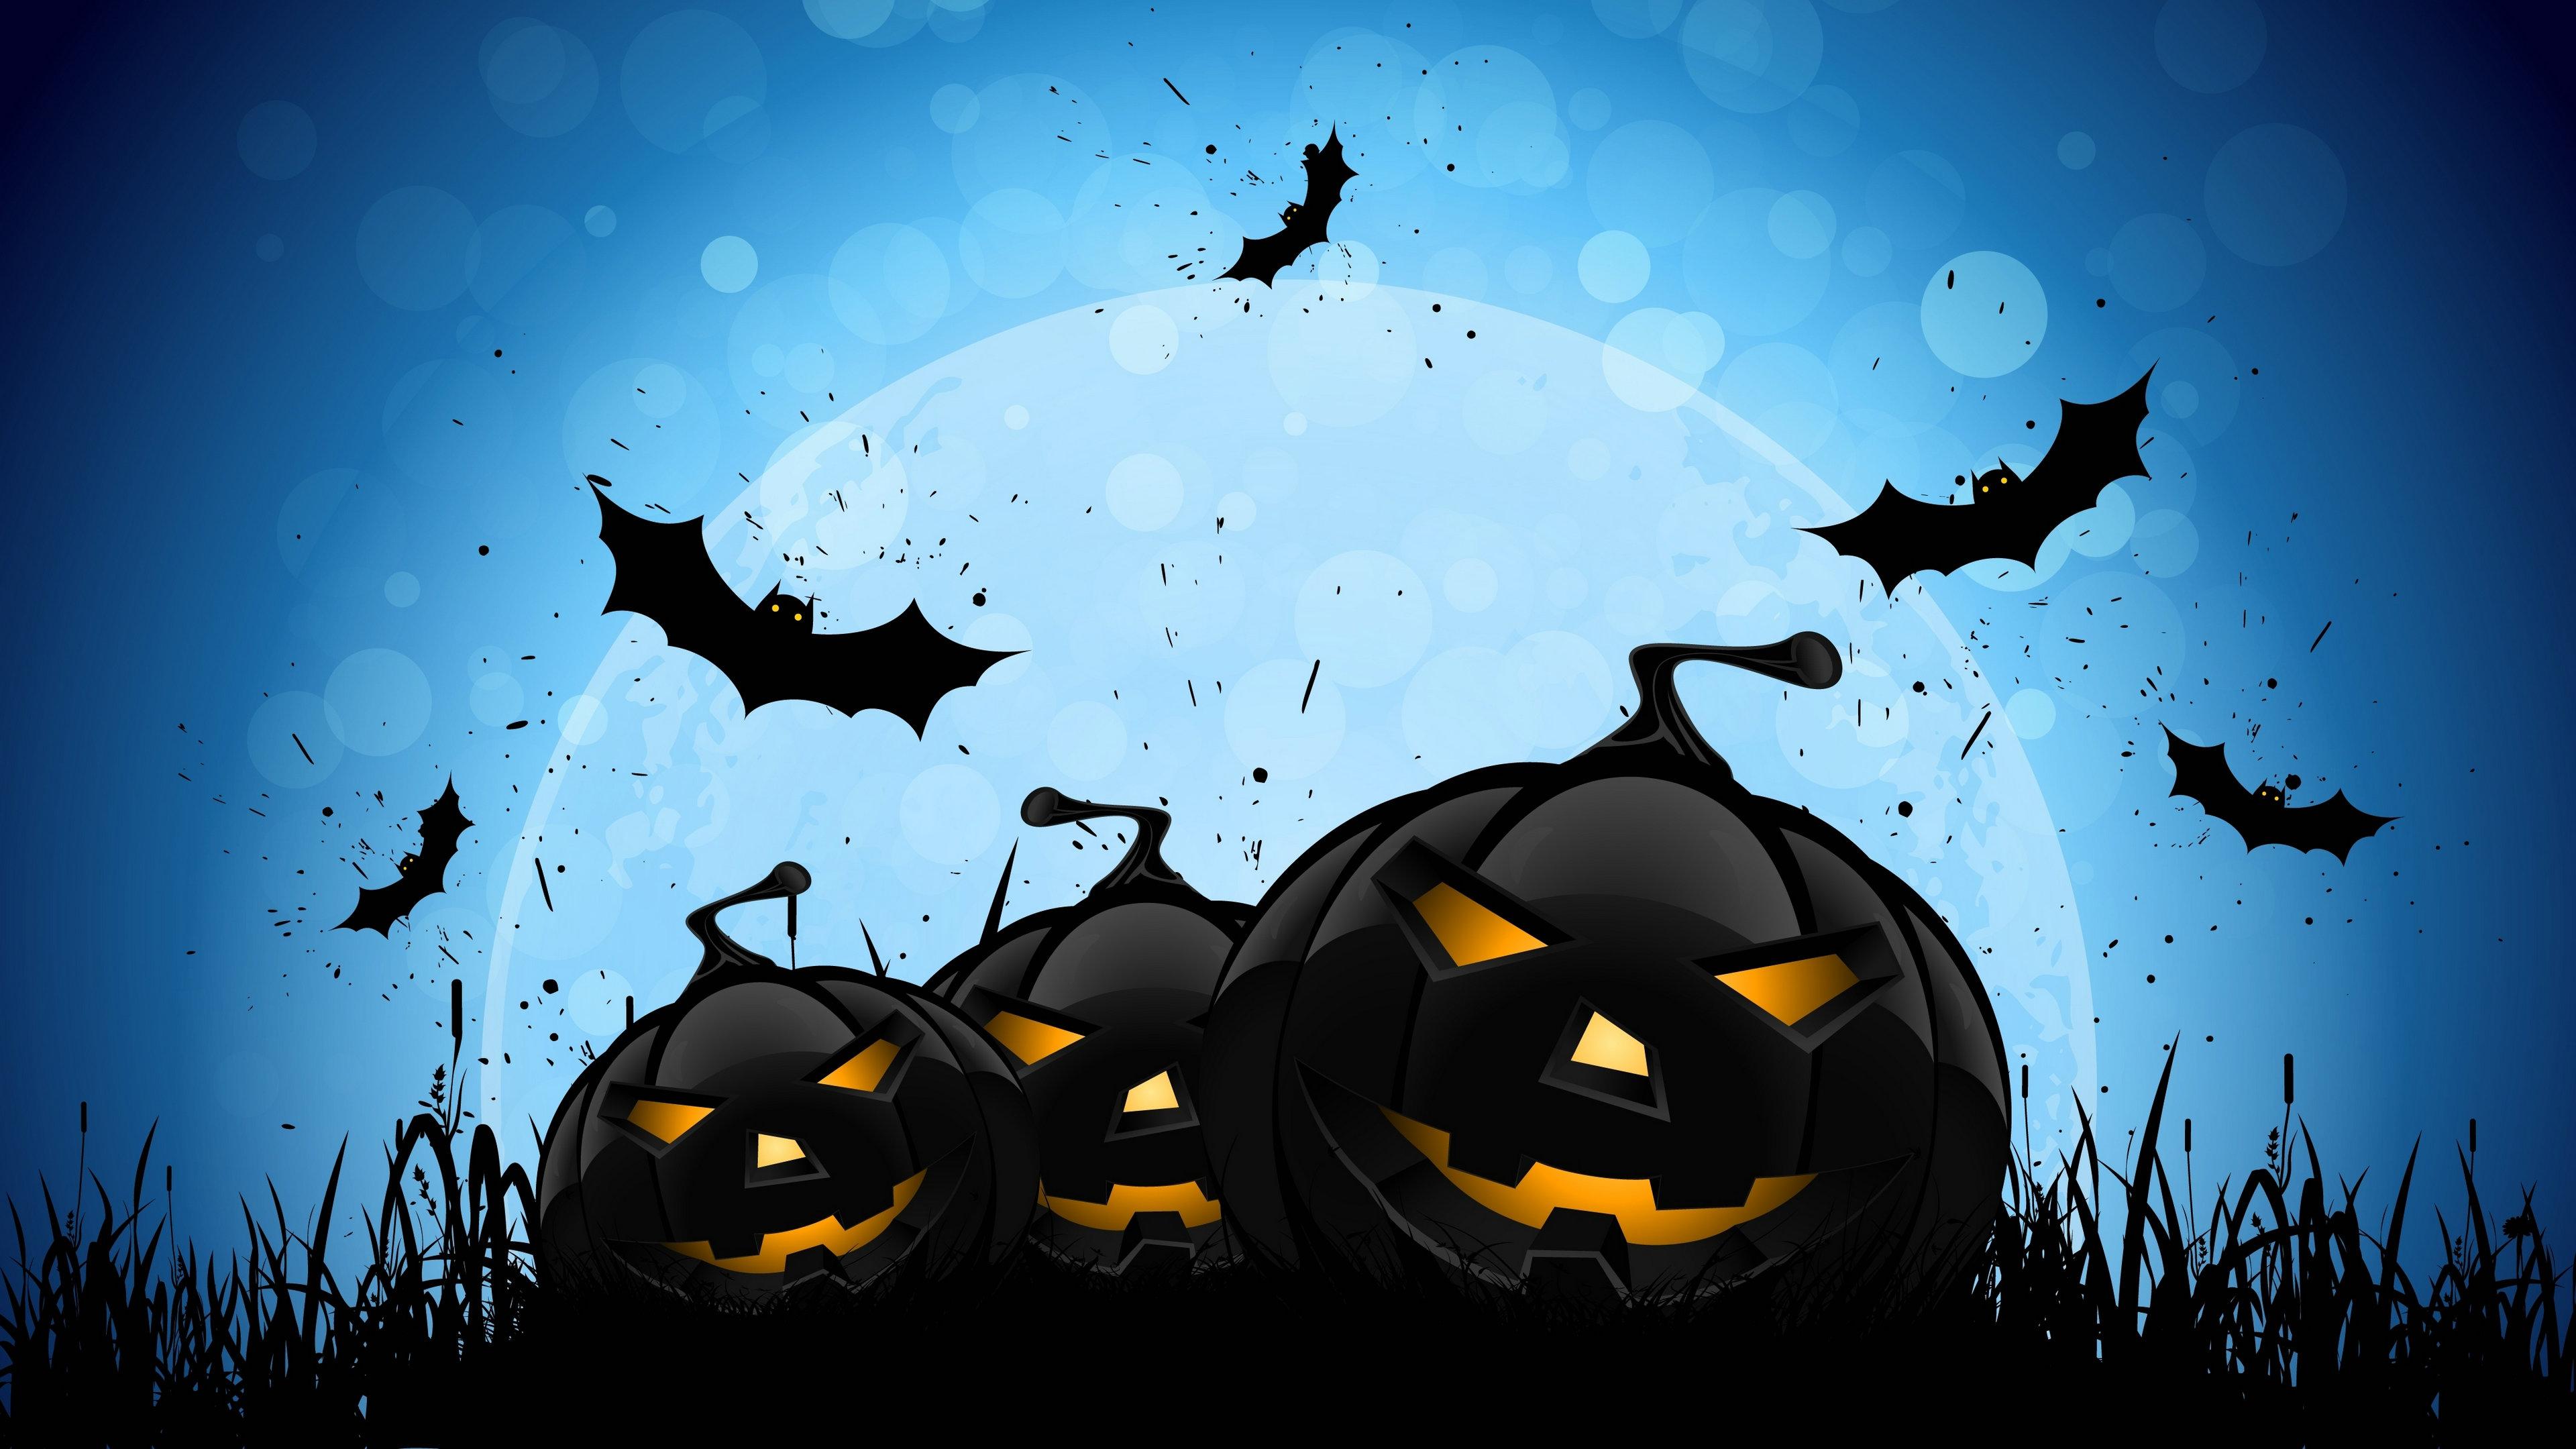 black hd halloween image